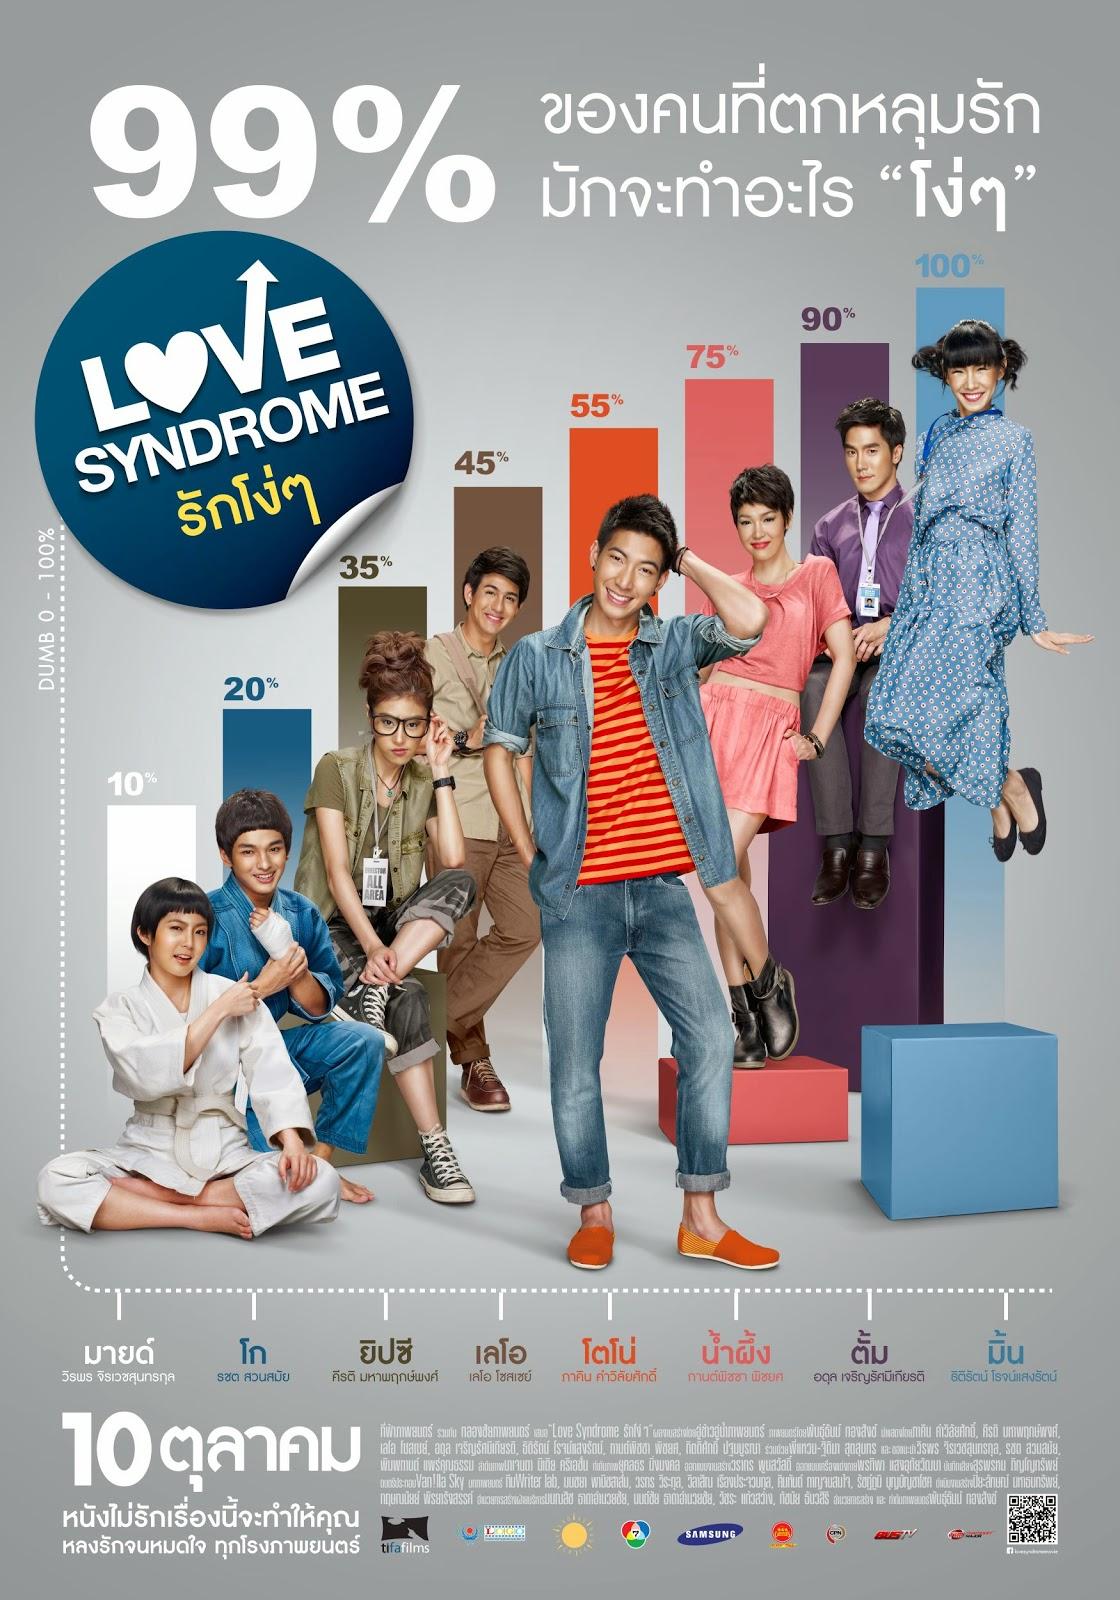 Yêu Là Yêu - Love Syndrome